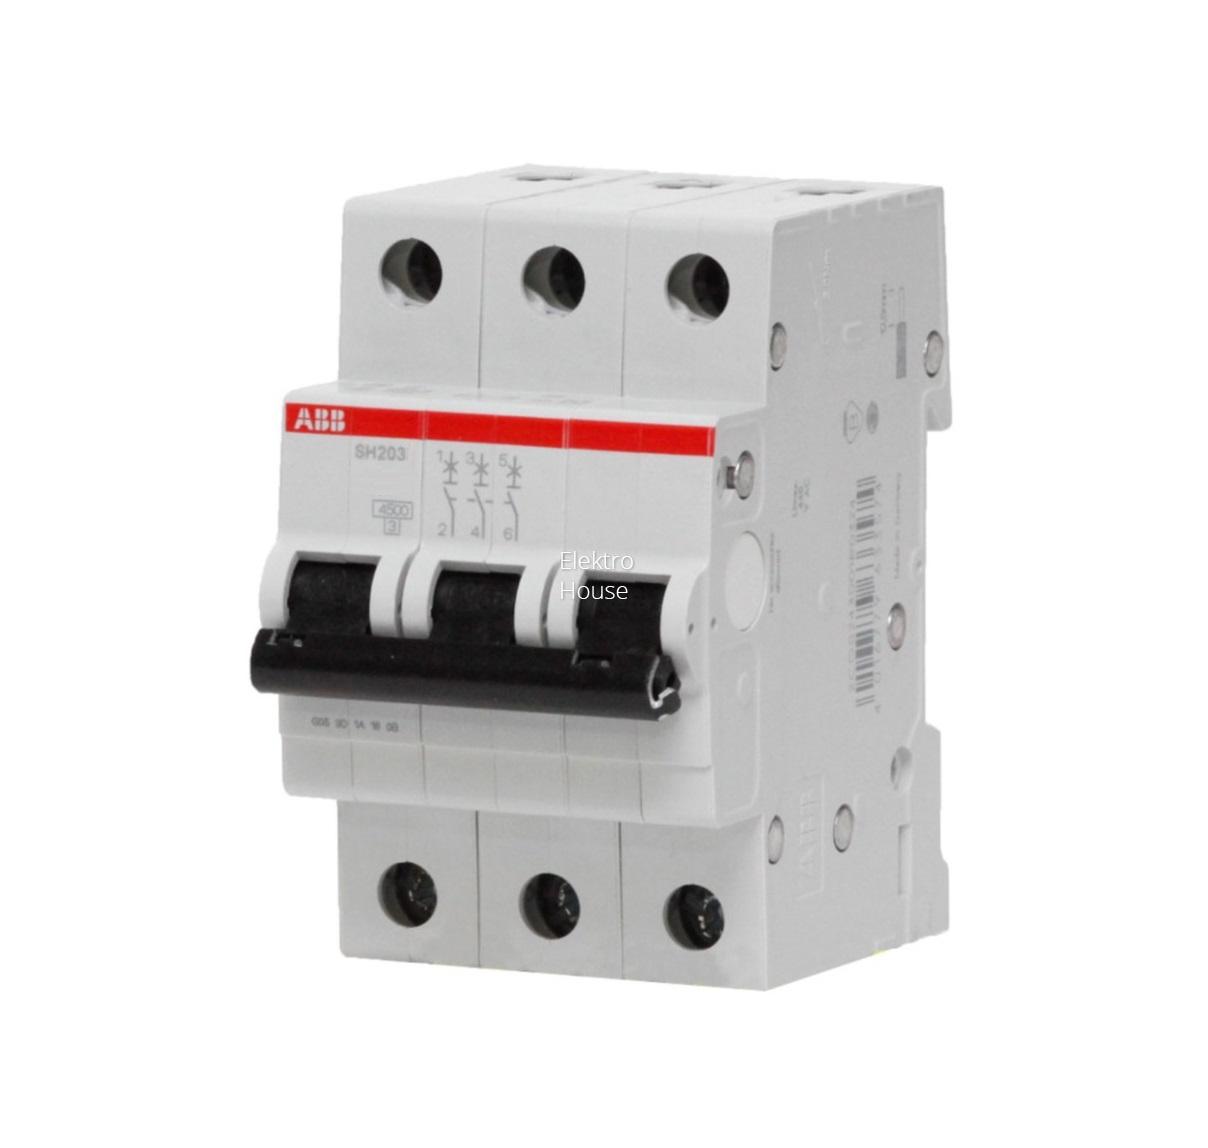 Выключатель Abb 2cds213001r0504 выключатель abb 2csr145001r1064